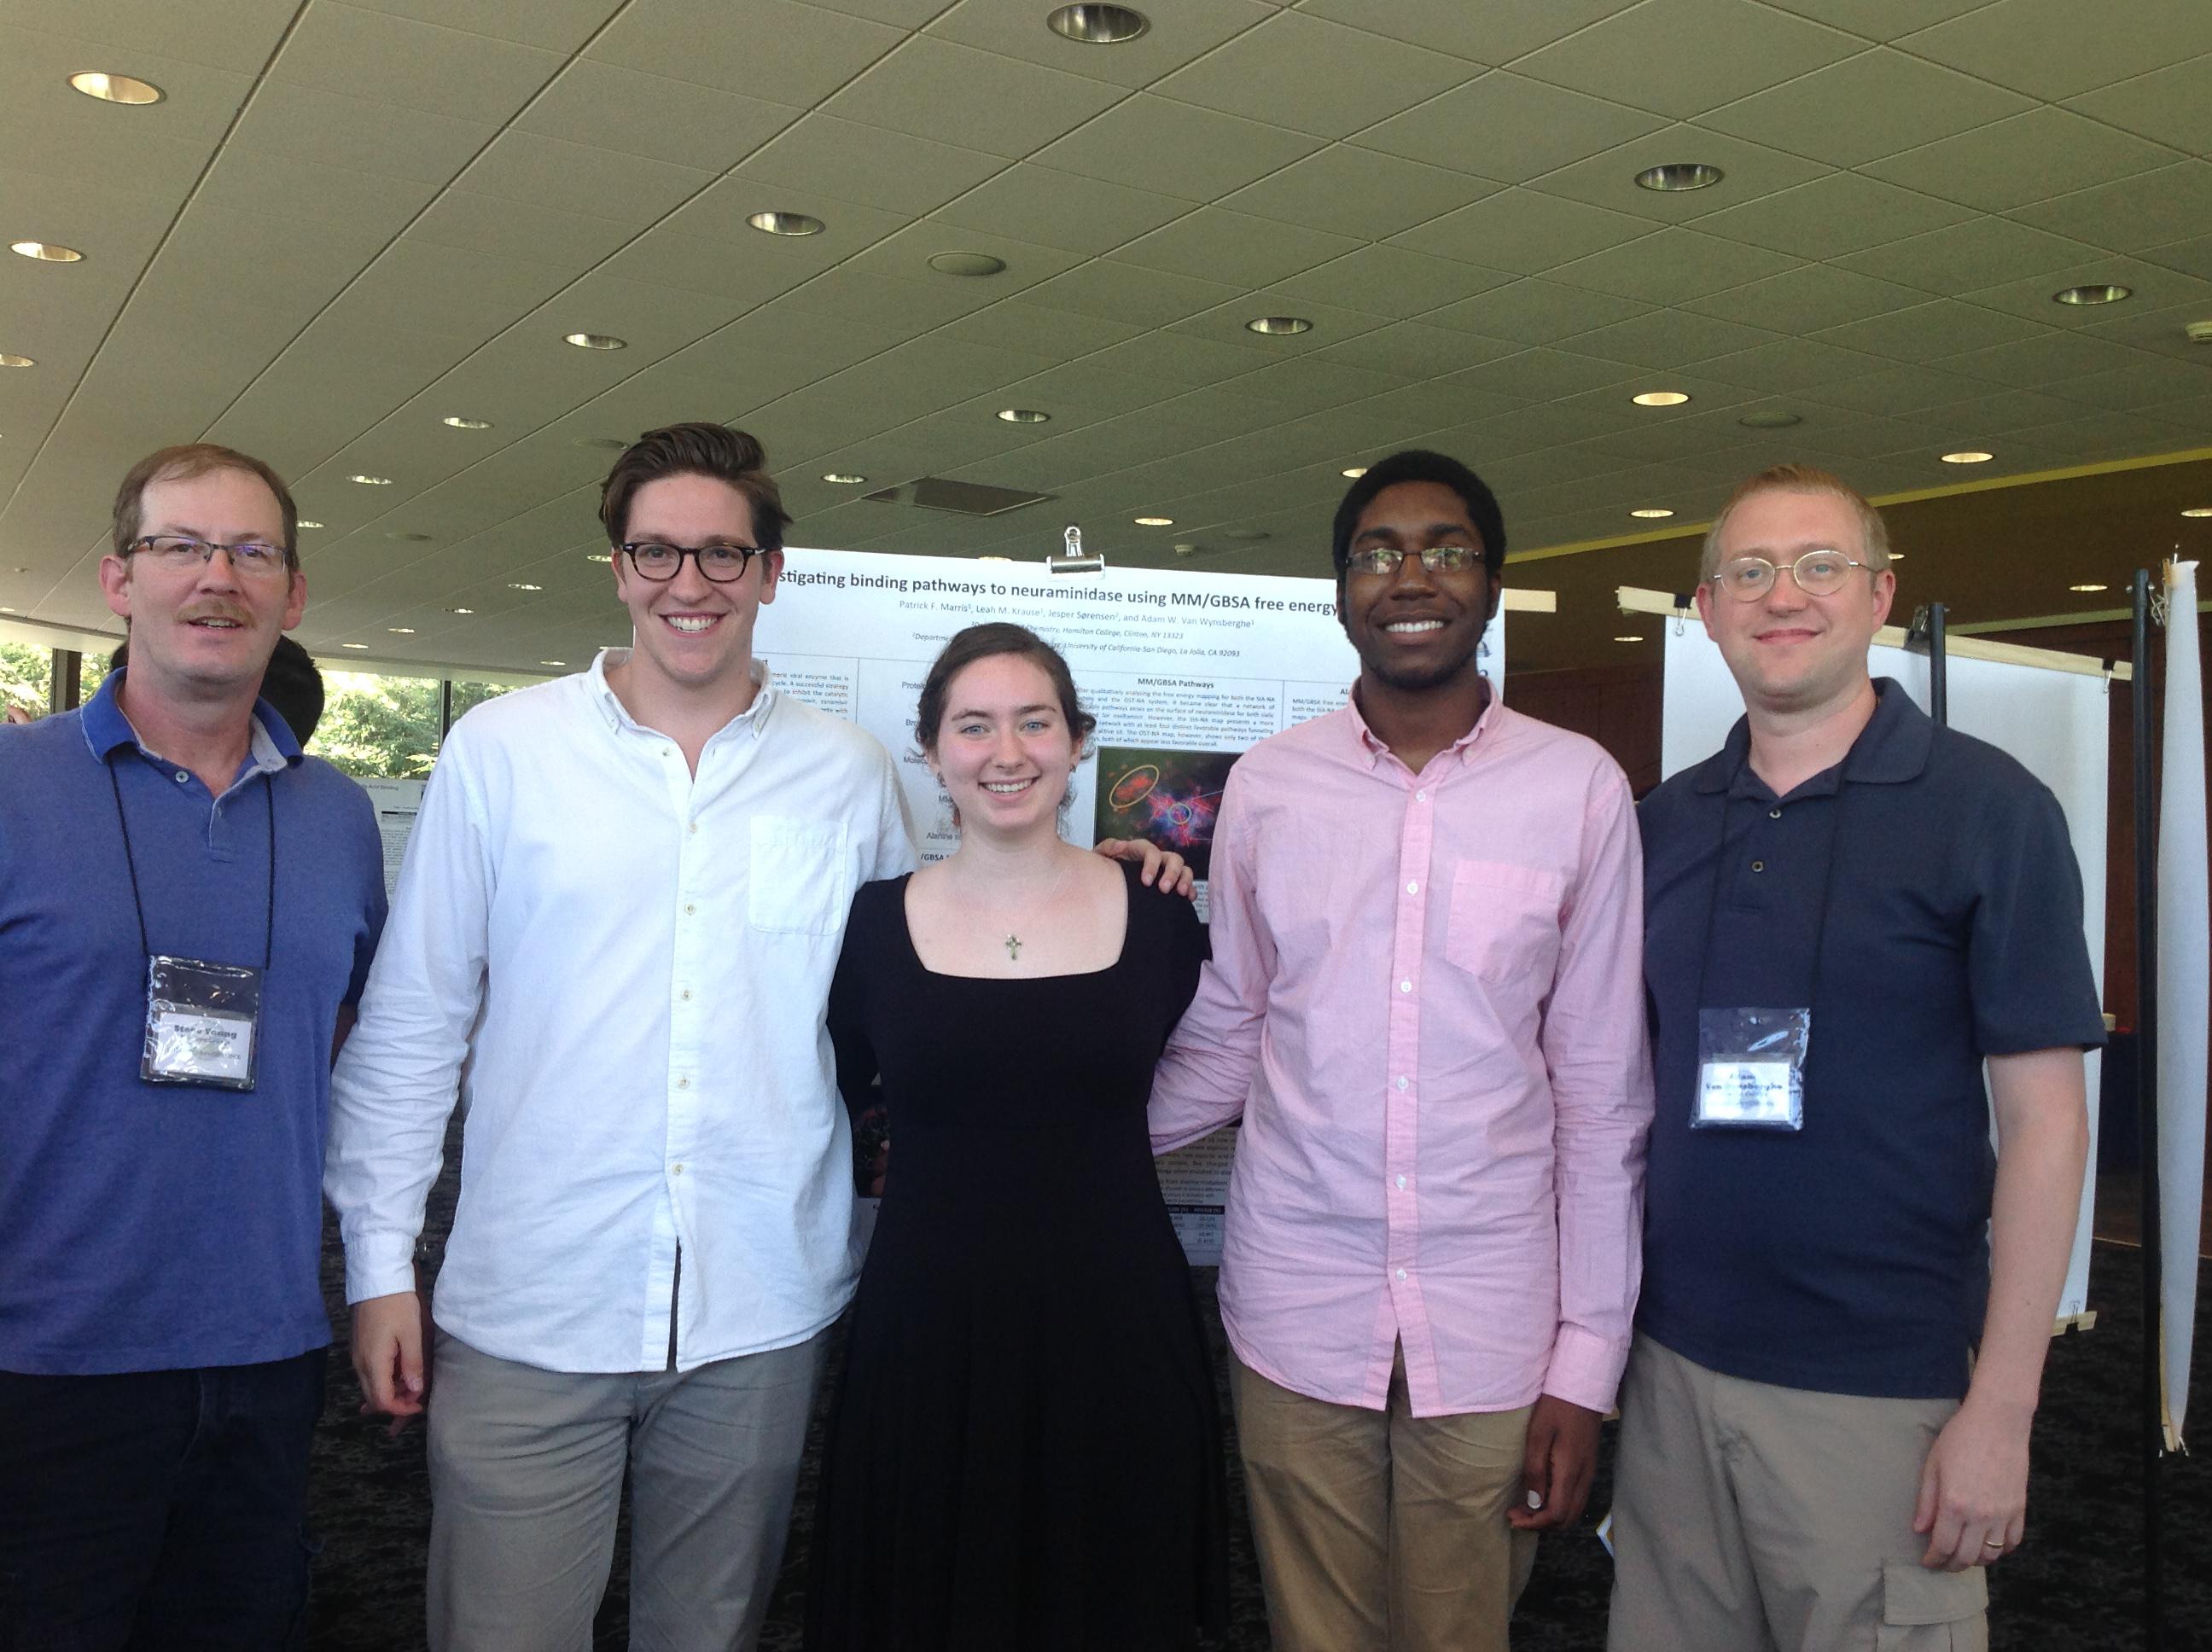 From left; Steve Young, Pat Marris '16, Erin Lewis '18, David Dacres '18 and Prof. Adam Van Wynsberghe,